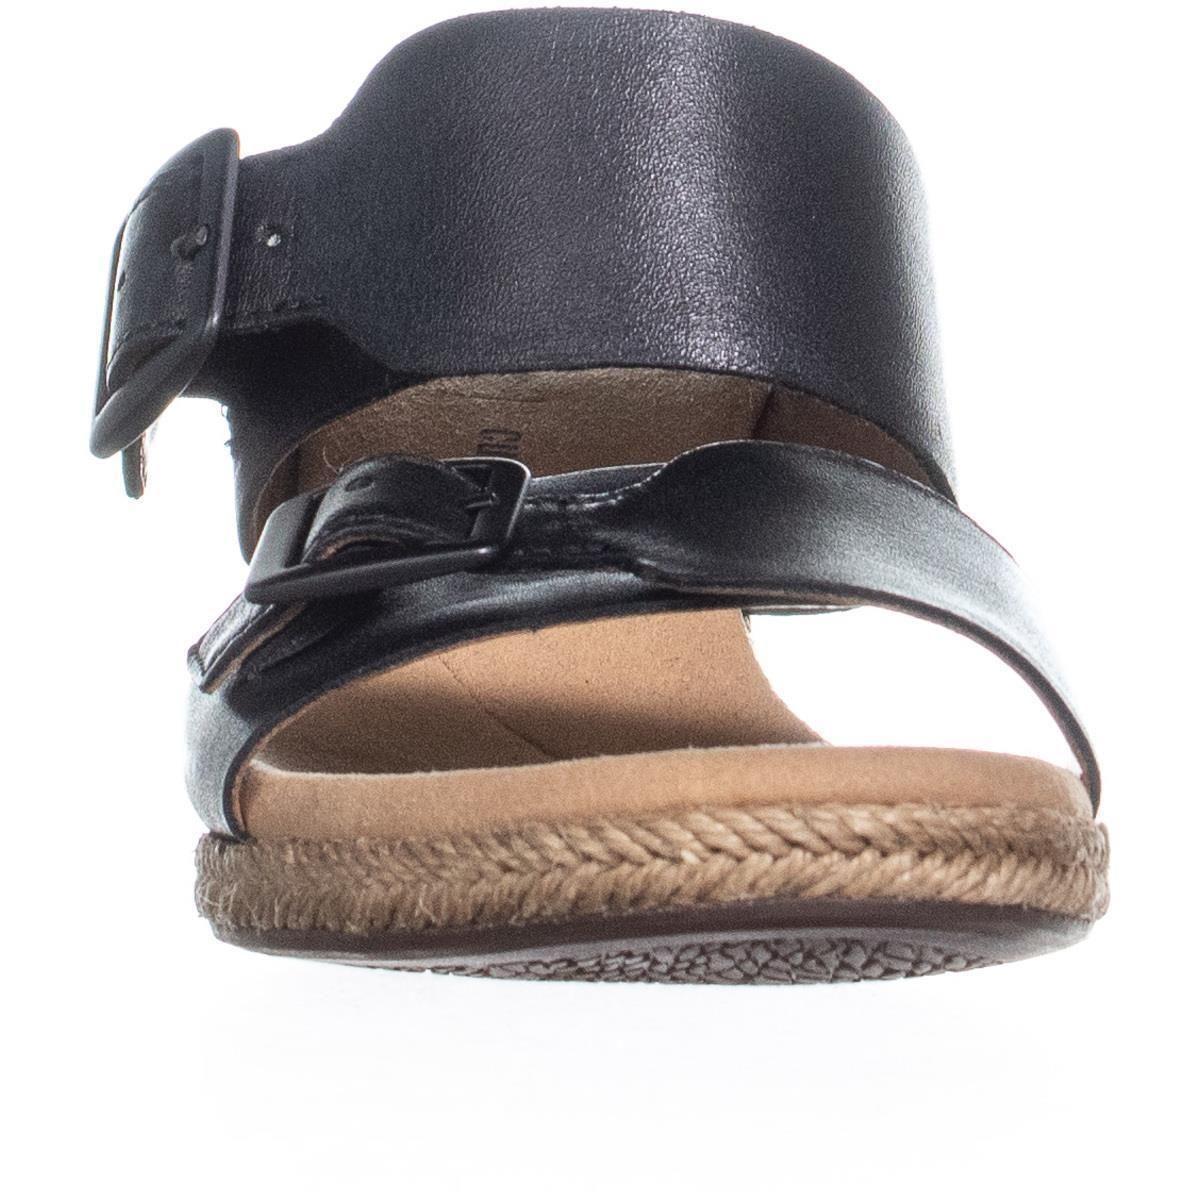 881c365be1ea Clarks - Black Lafley Devin Wedge Espadrilles Sandals - Lyst. View  fullscreen